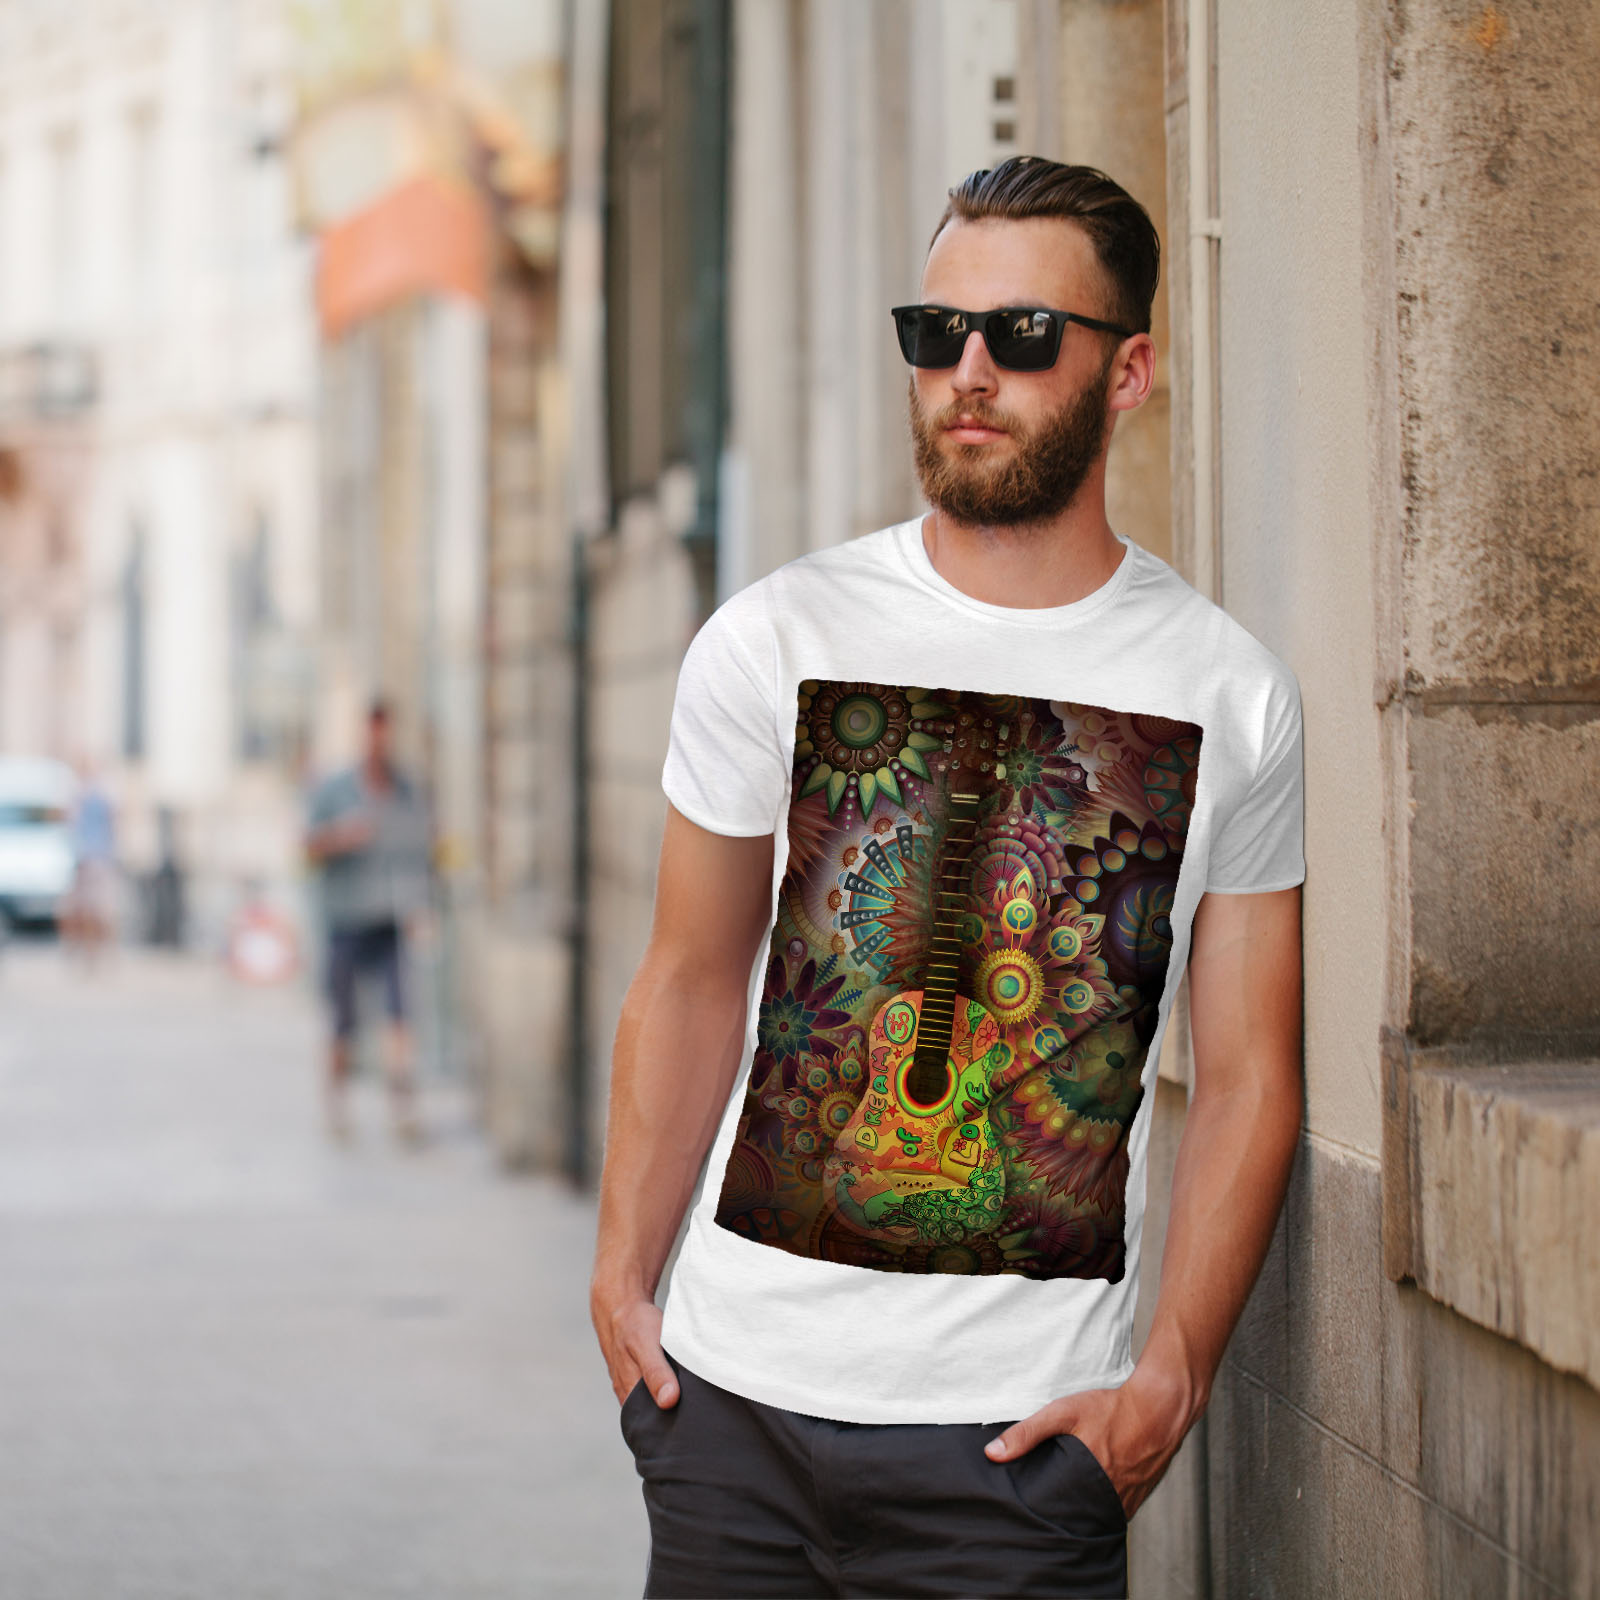 Wellcoda-Colorful-Guitar-Mens-T-shirt-Music-Graphic-Design-Printed-Tee thumbnail 11